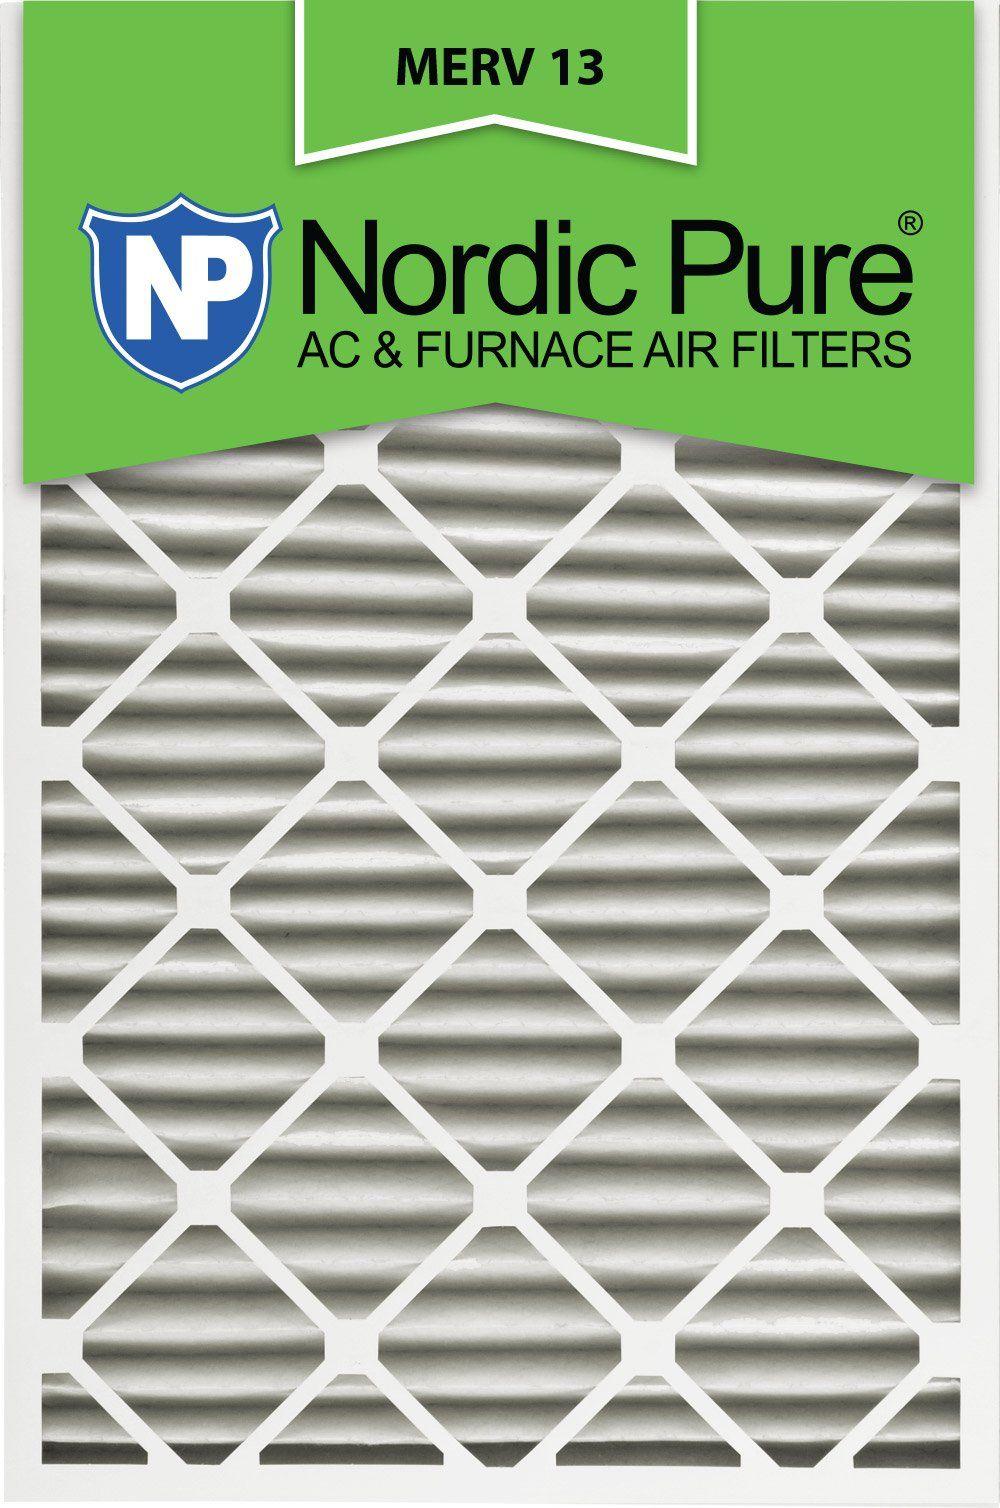 Nordic Pure 24x30x2M133 24x30x2 MERV 13 Pleated AC Furnace